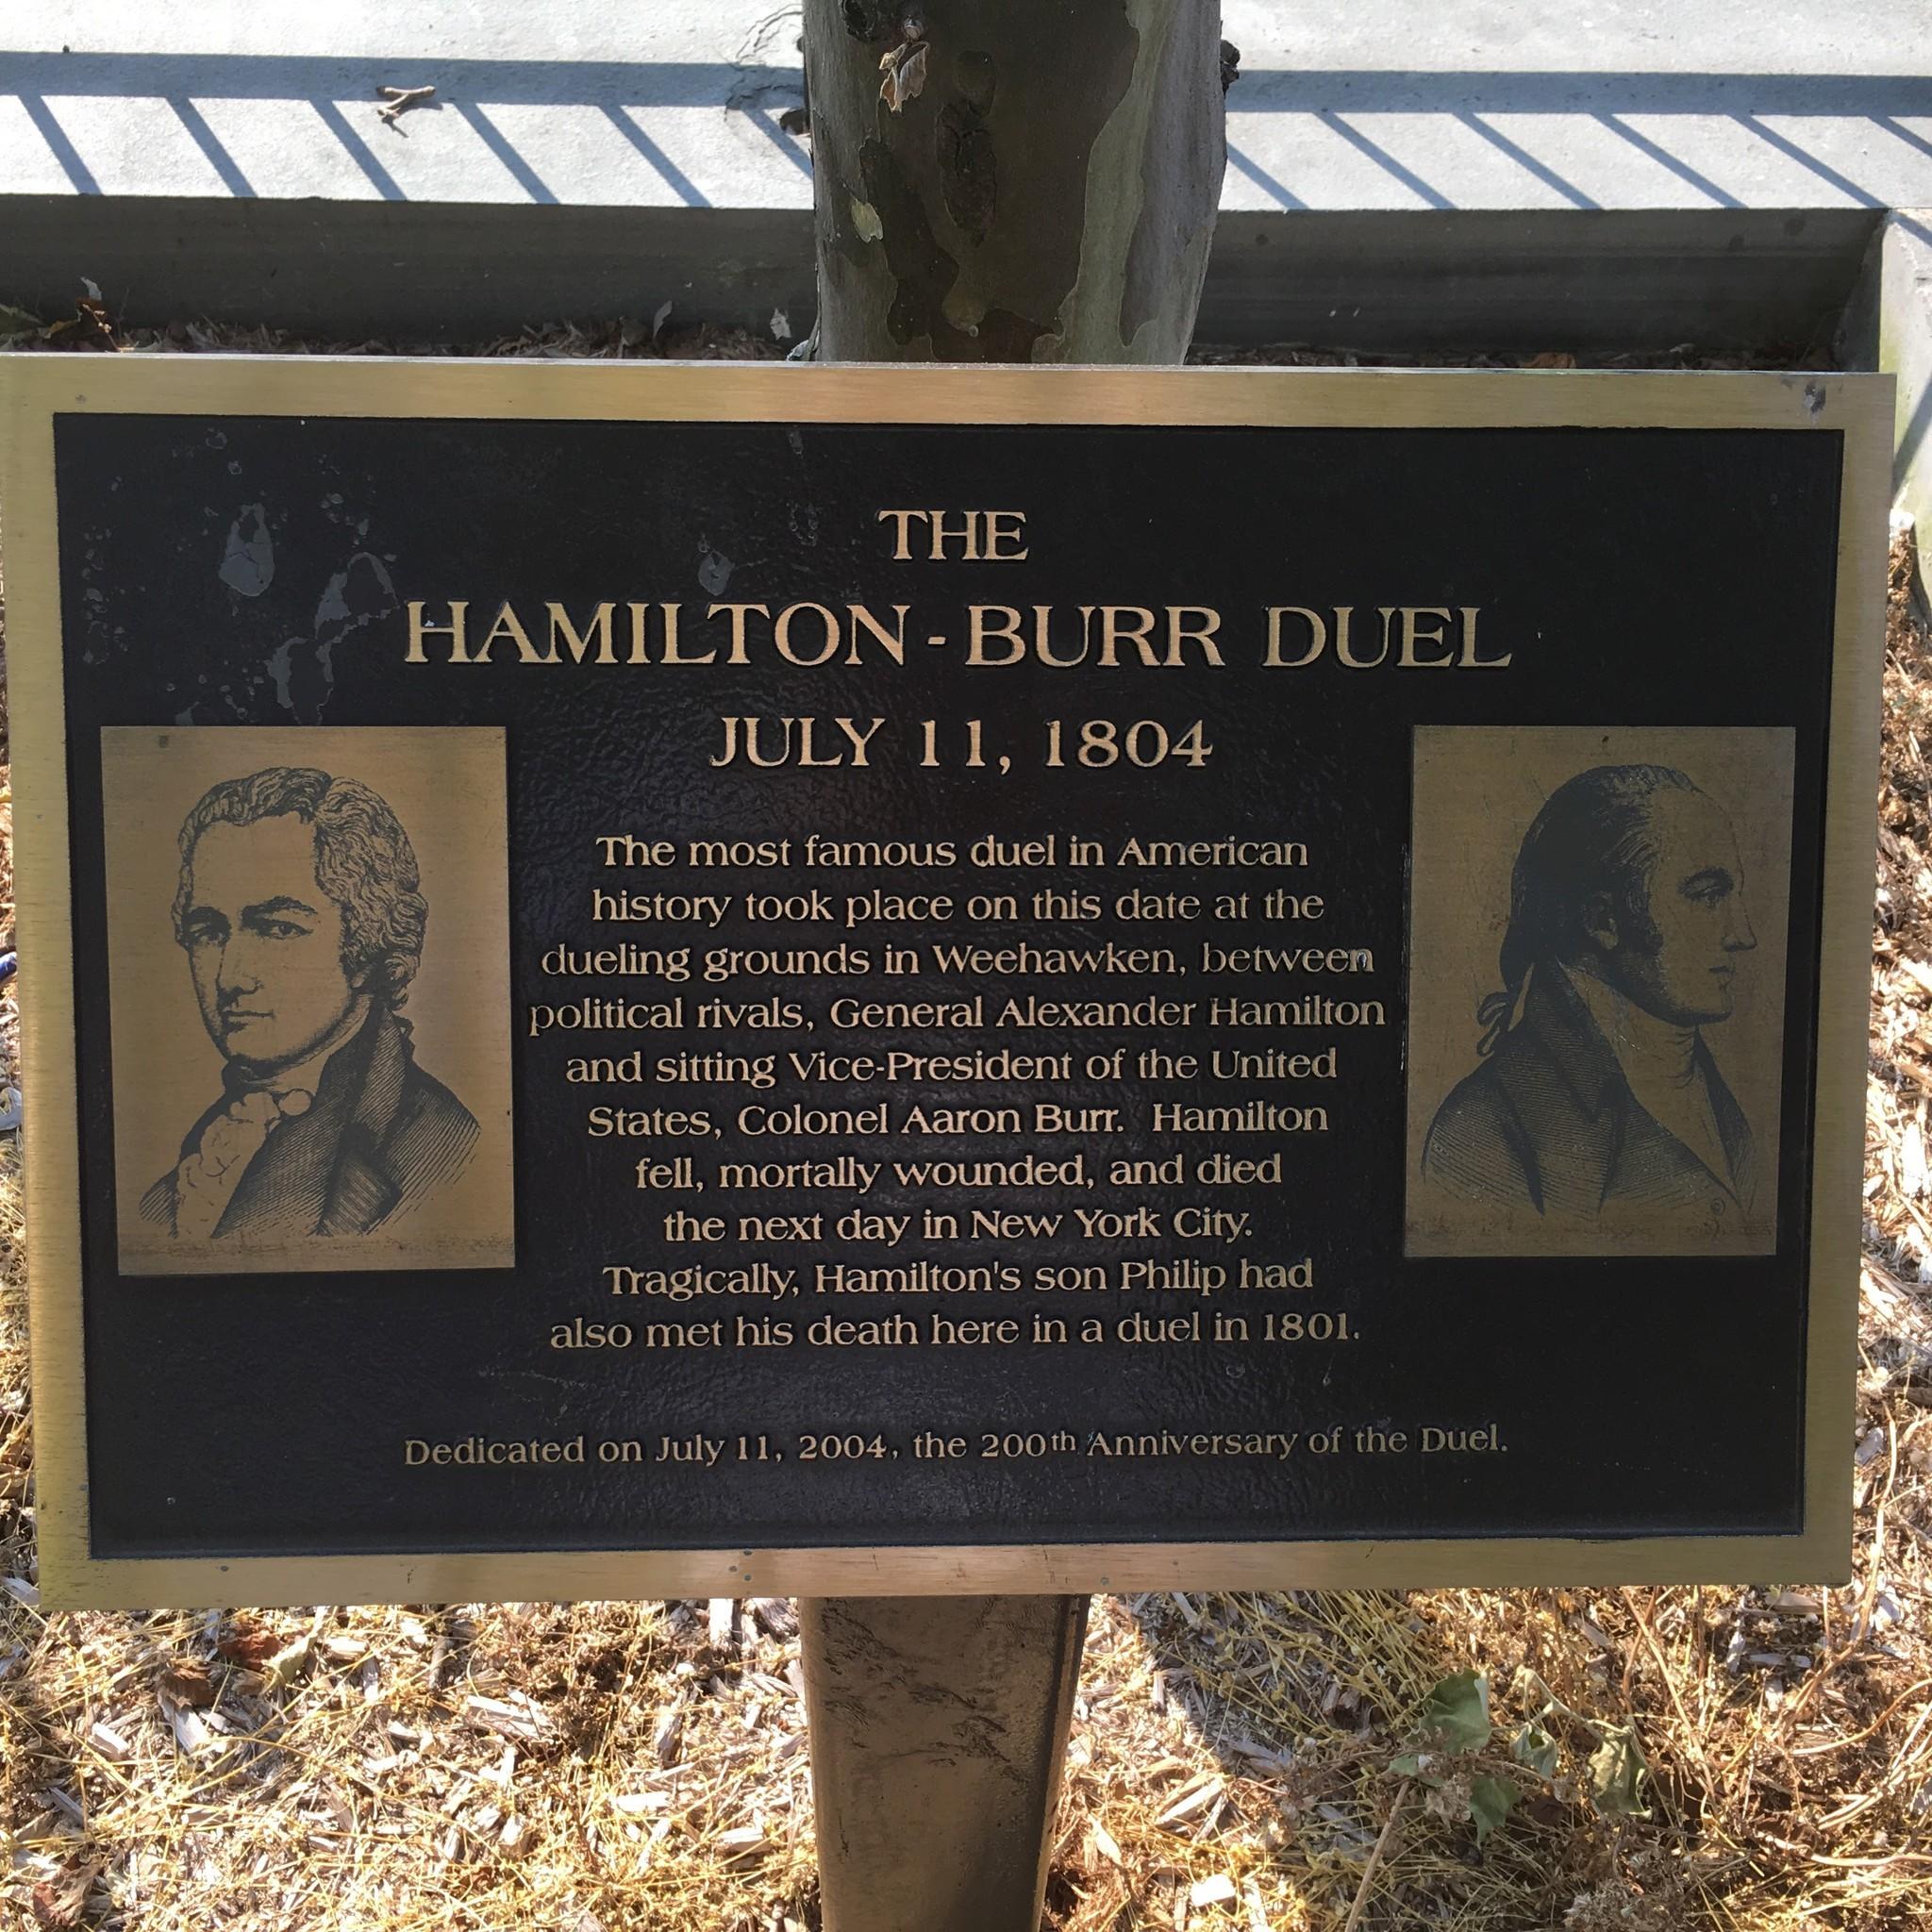 An East Coast tour for die-hard Hamilton fans